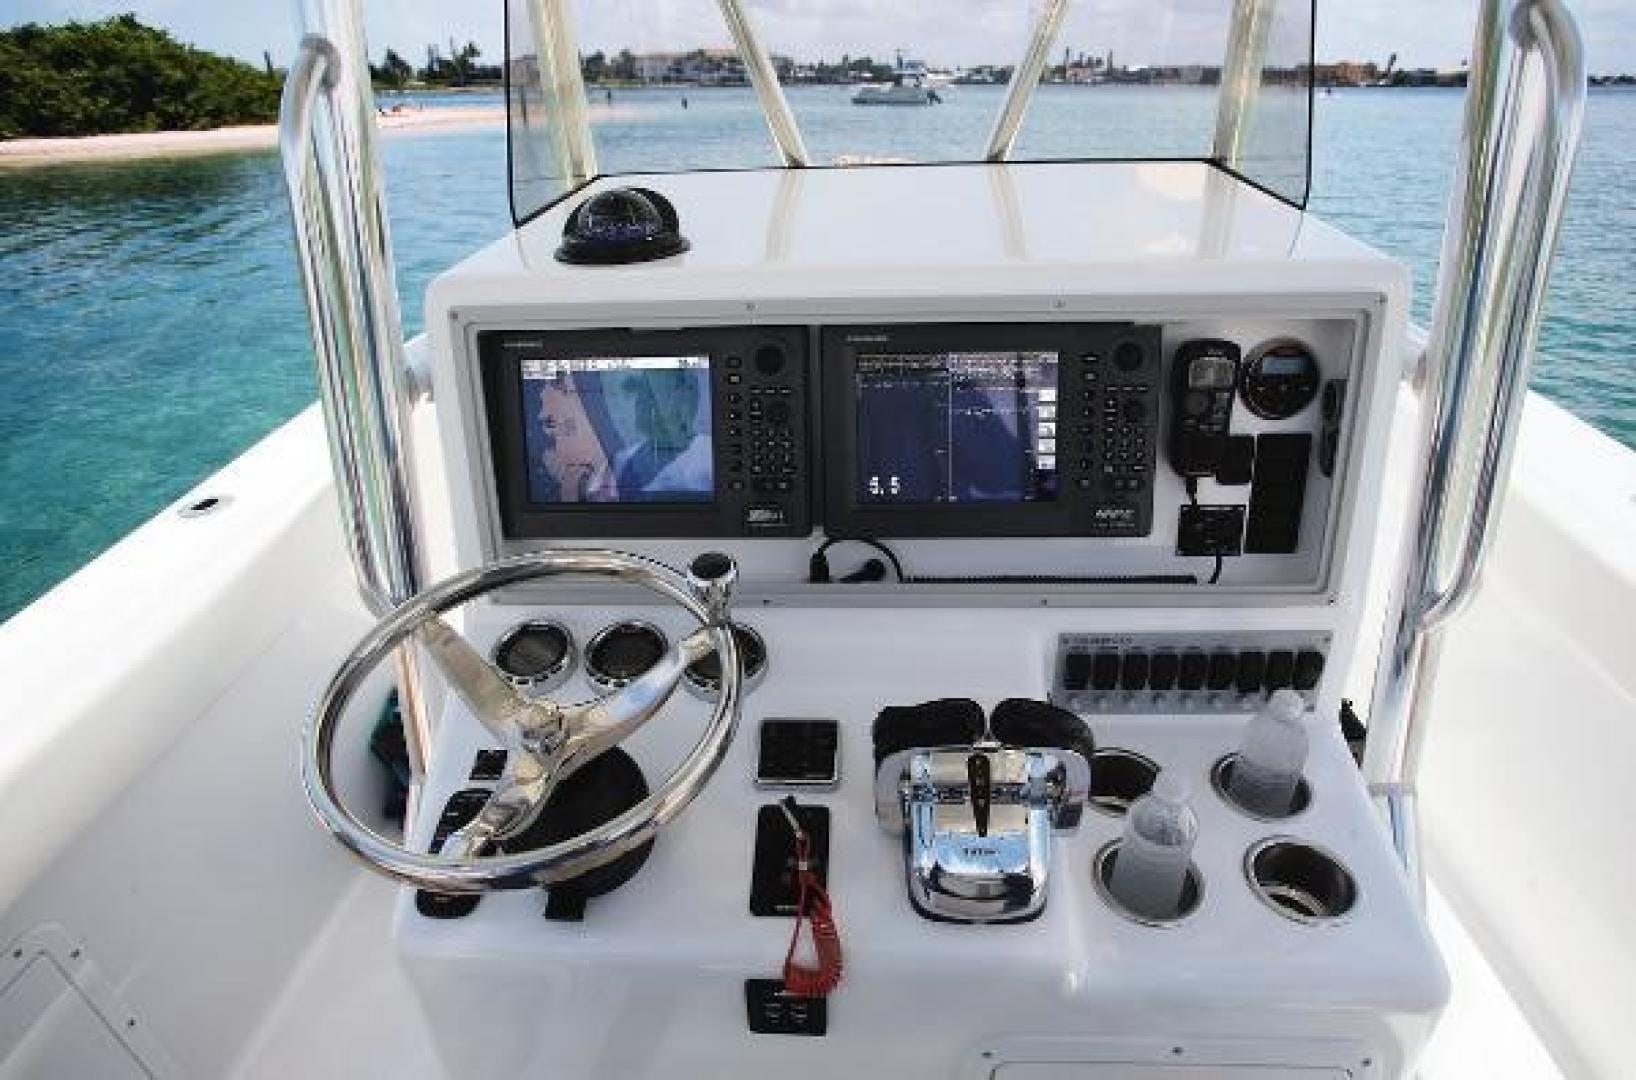 2020 Bluewater Sportfishing 27' 2850 Bluewater Sportfishing 2850   Picture 7 of 16